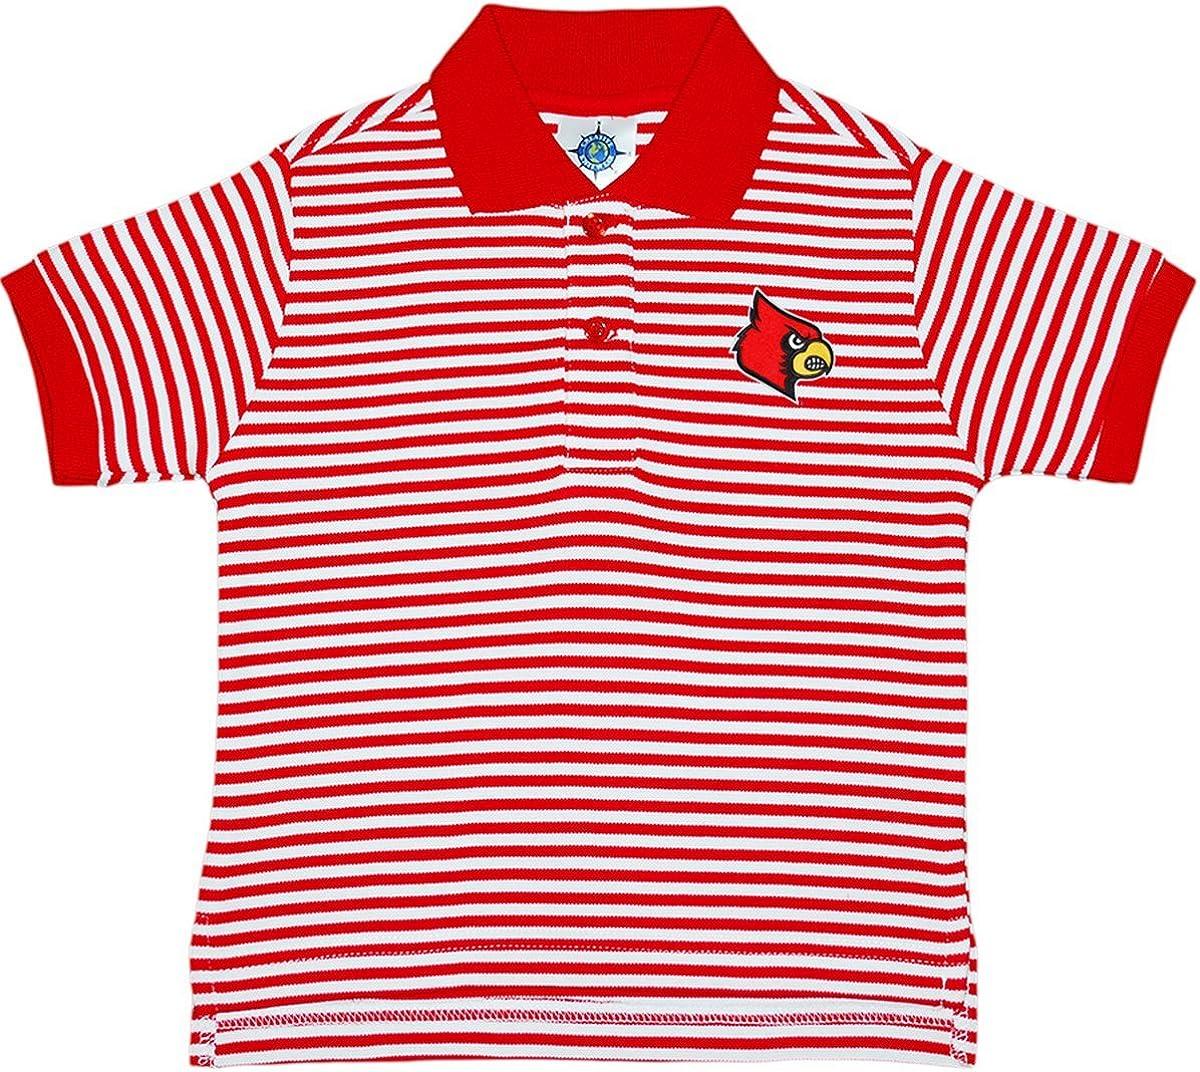 Creative Knitwear University of Louisville Cardinals Striped Polo Shirt